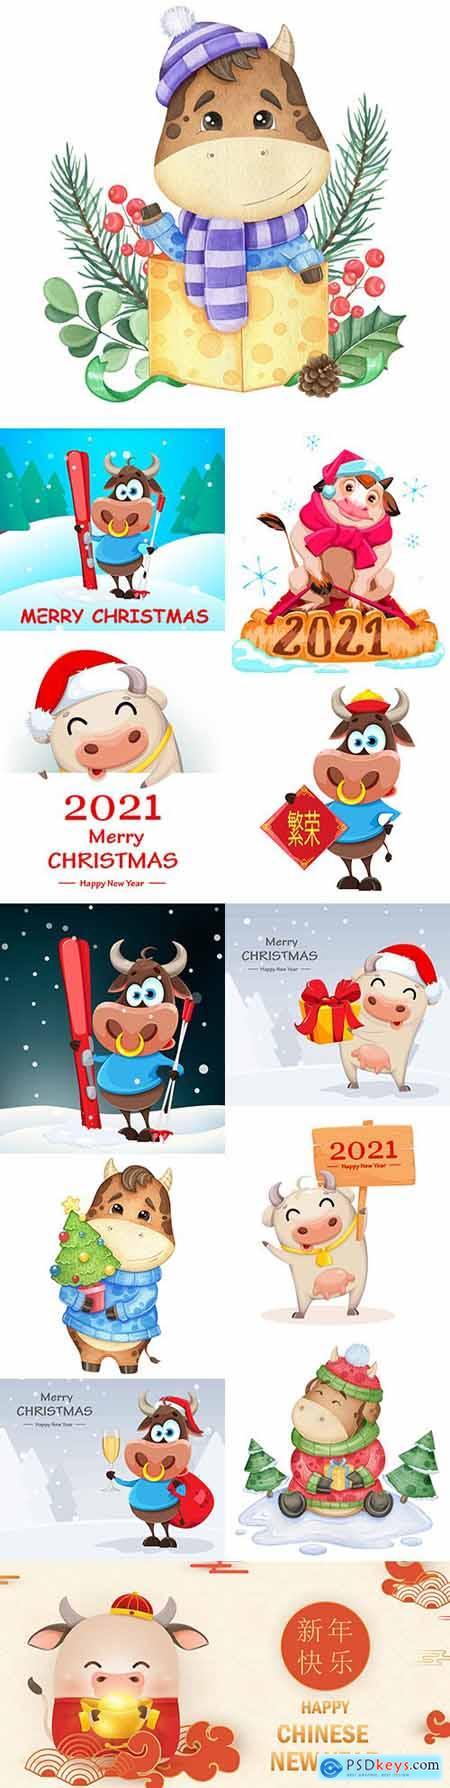 Bull Chinese calendar symbol 2021 cartoon illustration